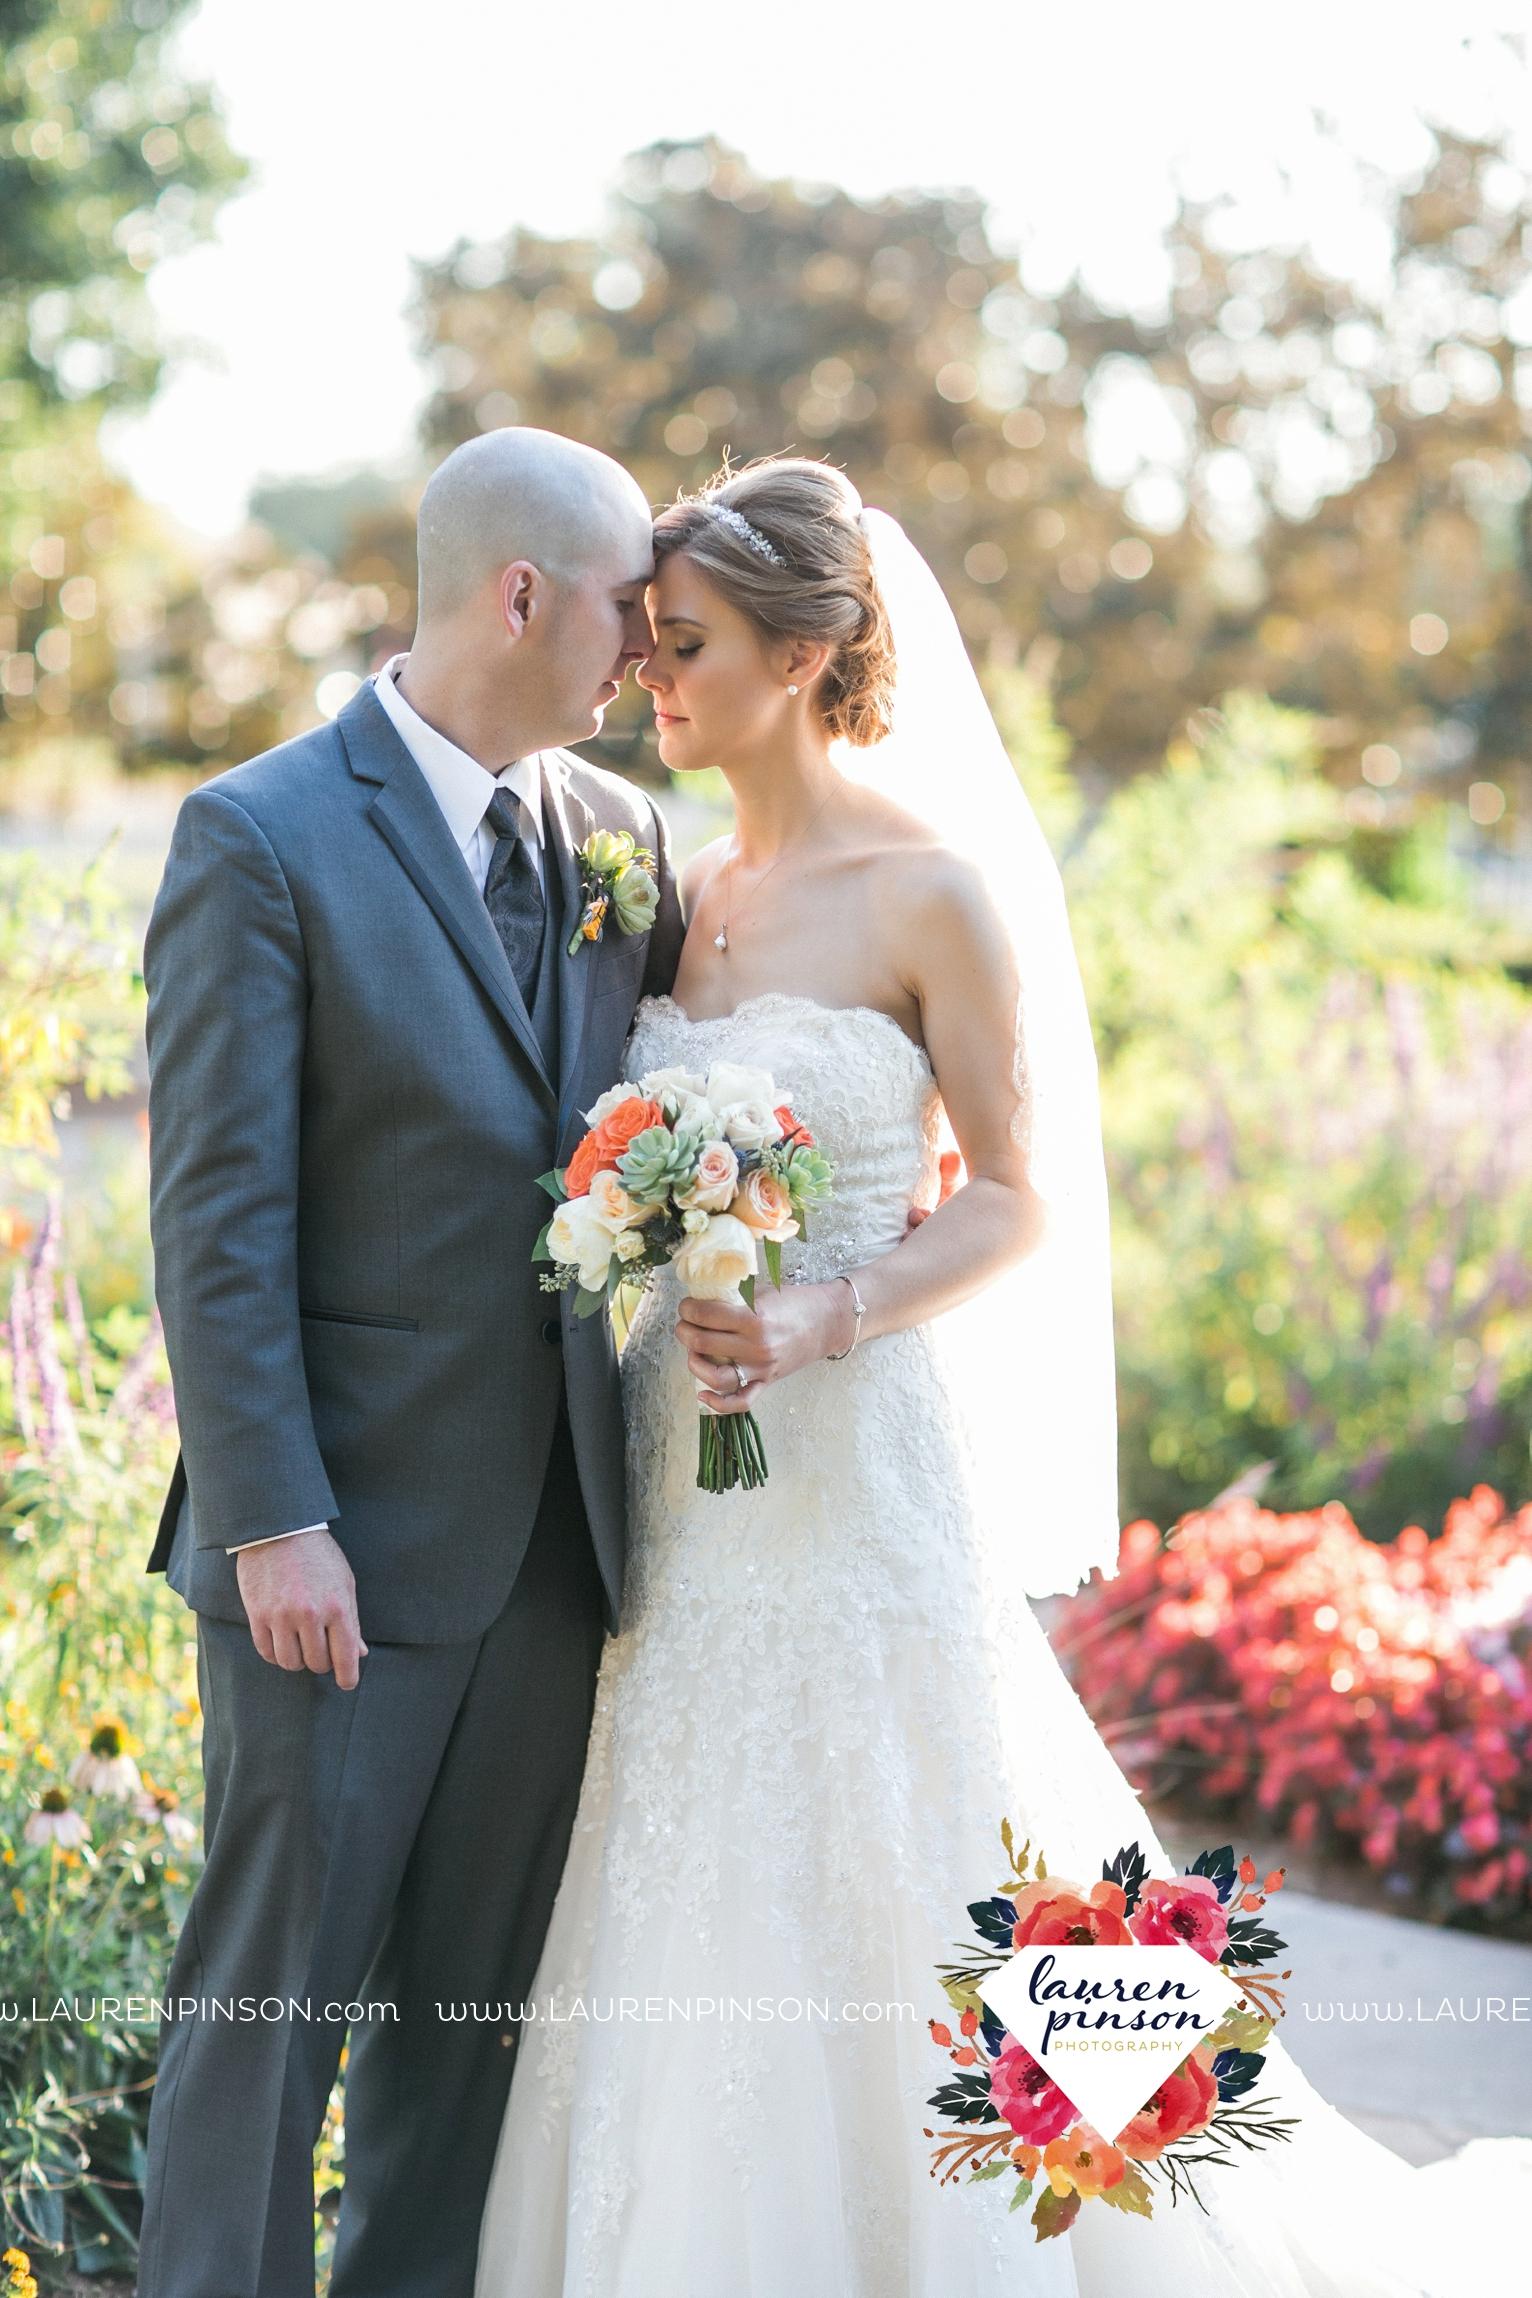 kemp-center-for-the-arts-wichita-falls-texas-wedding-photographer-fall-wedding-pumpkins-168.jpg